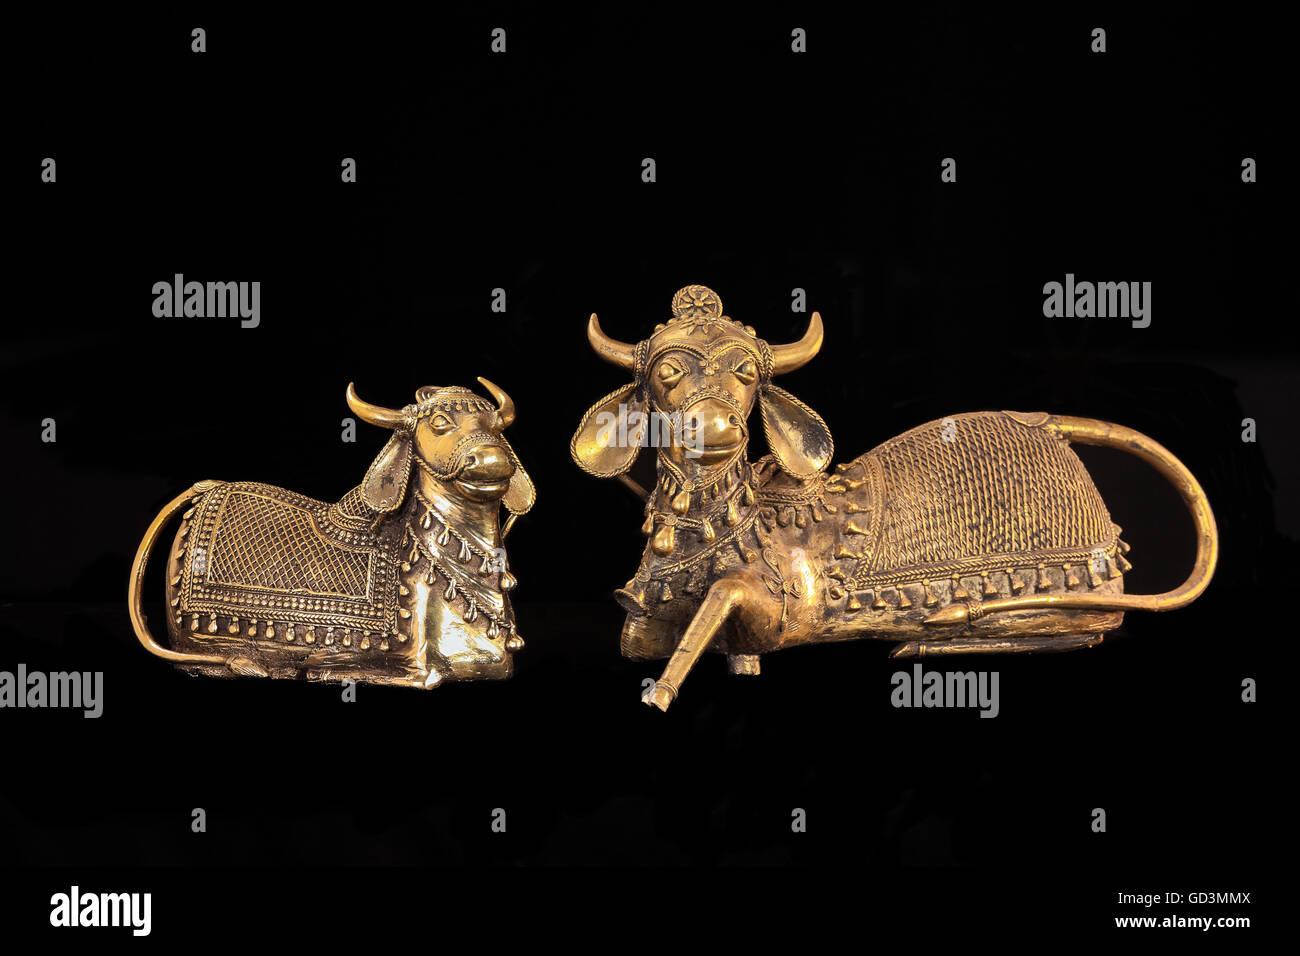 Bulls figurines, bastar, chhattisgarh, india, asia - Stock Image